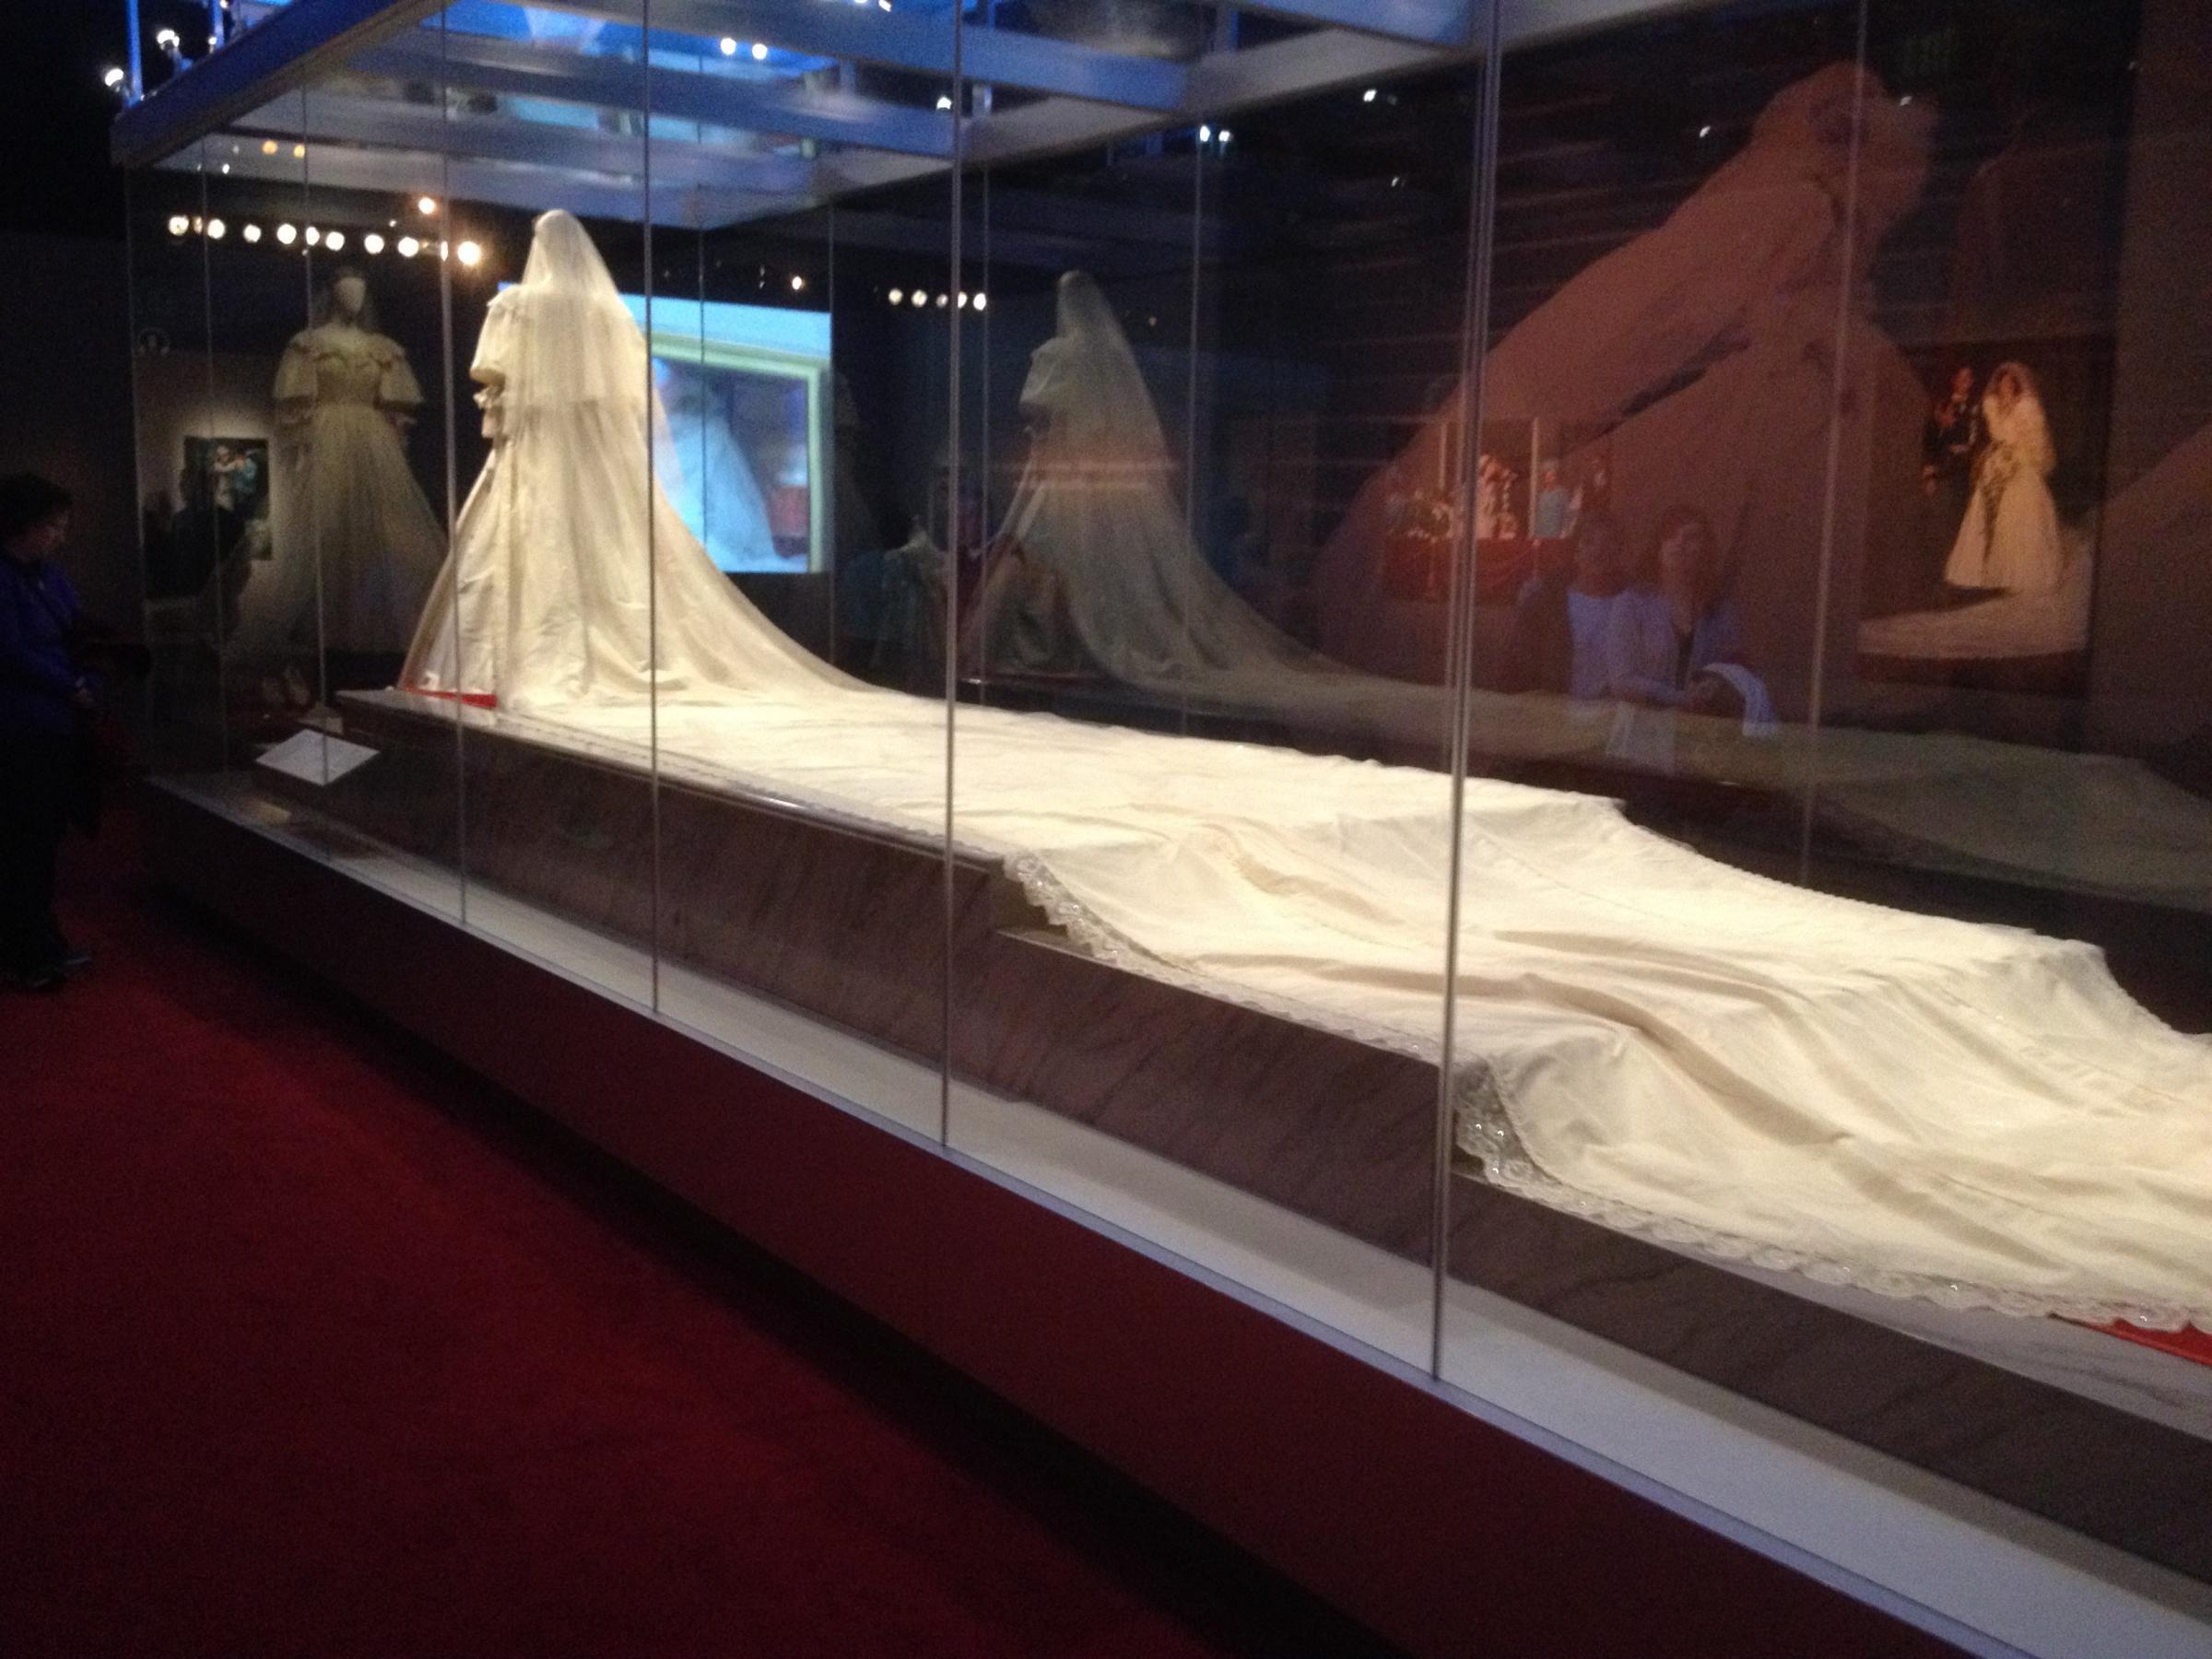 museum of princess diana - Google Search   Show Jason   Pinterest ...